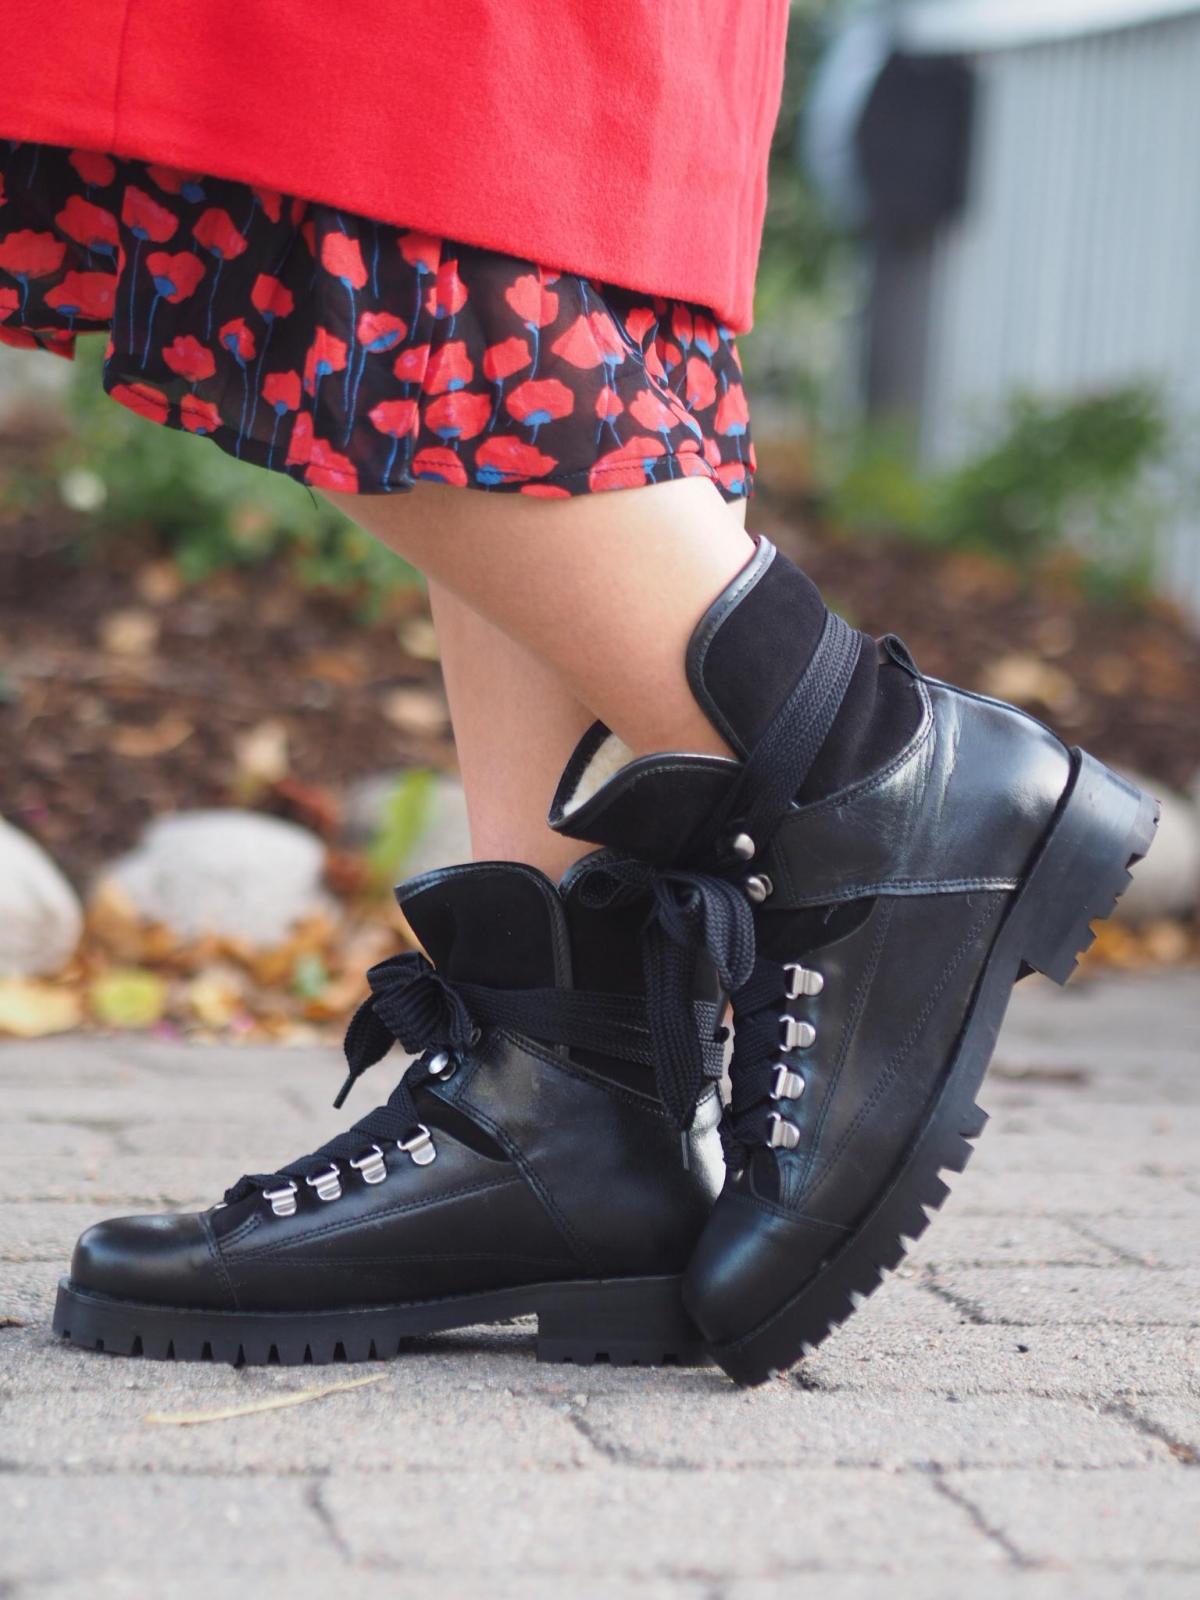 Pavement Støvler Alice Black | Sko, Sorte støvler og